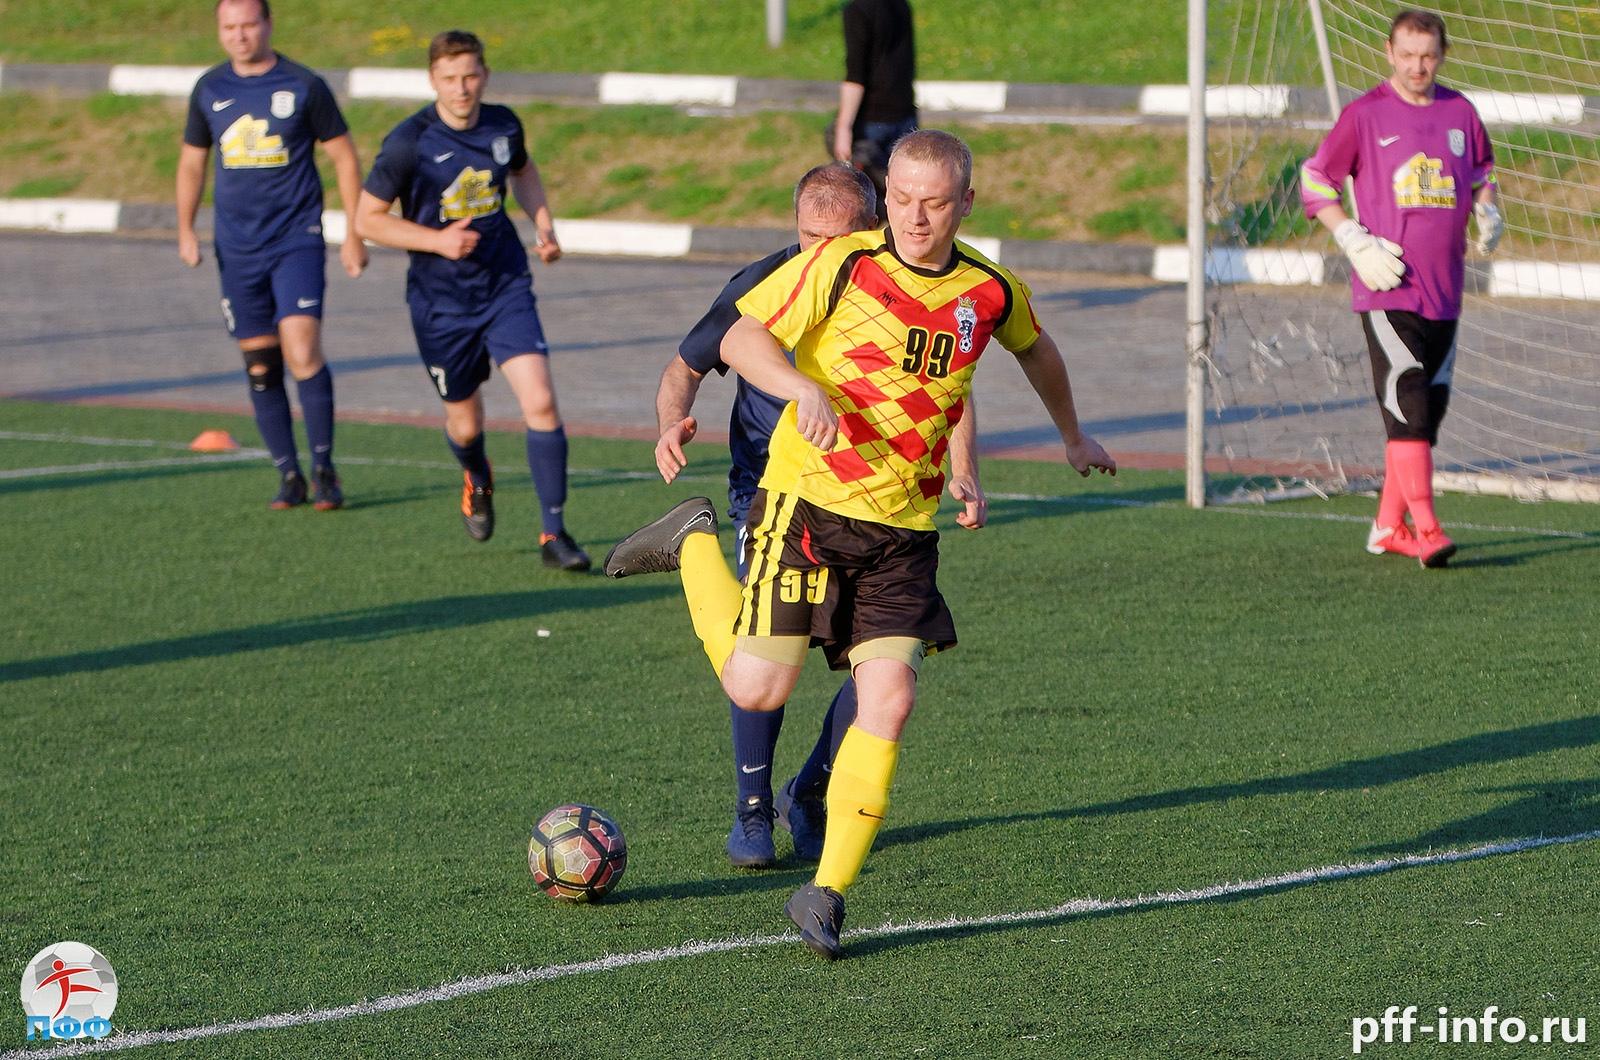 Премьер-лига ТДК. 9 тур. Матч тура